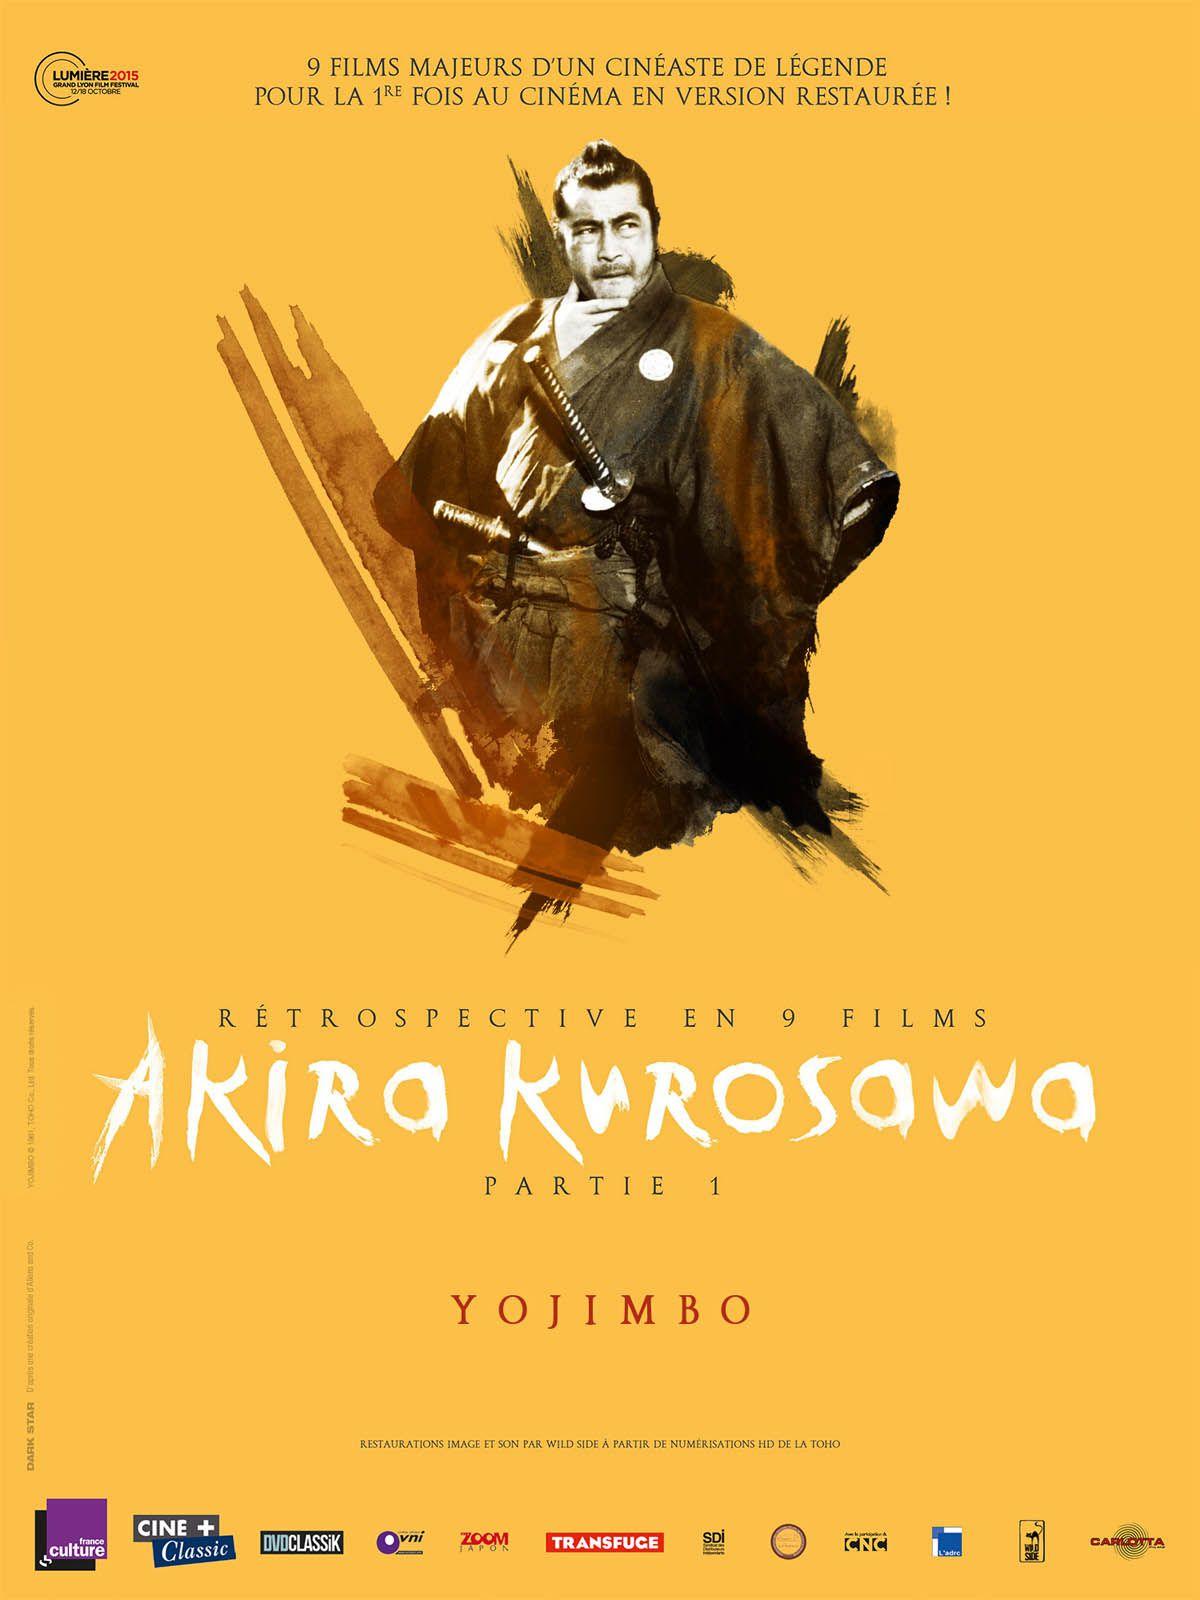 f2017ee678f1c4 Yojimbo - film 1961 - AlloCiné   movie poster   Film, Movie posters ...